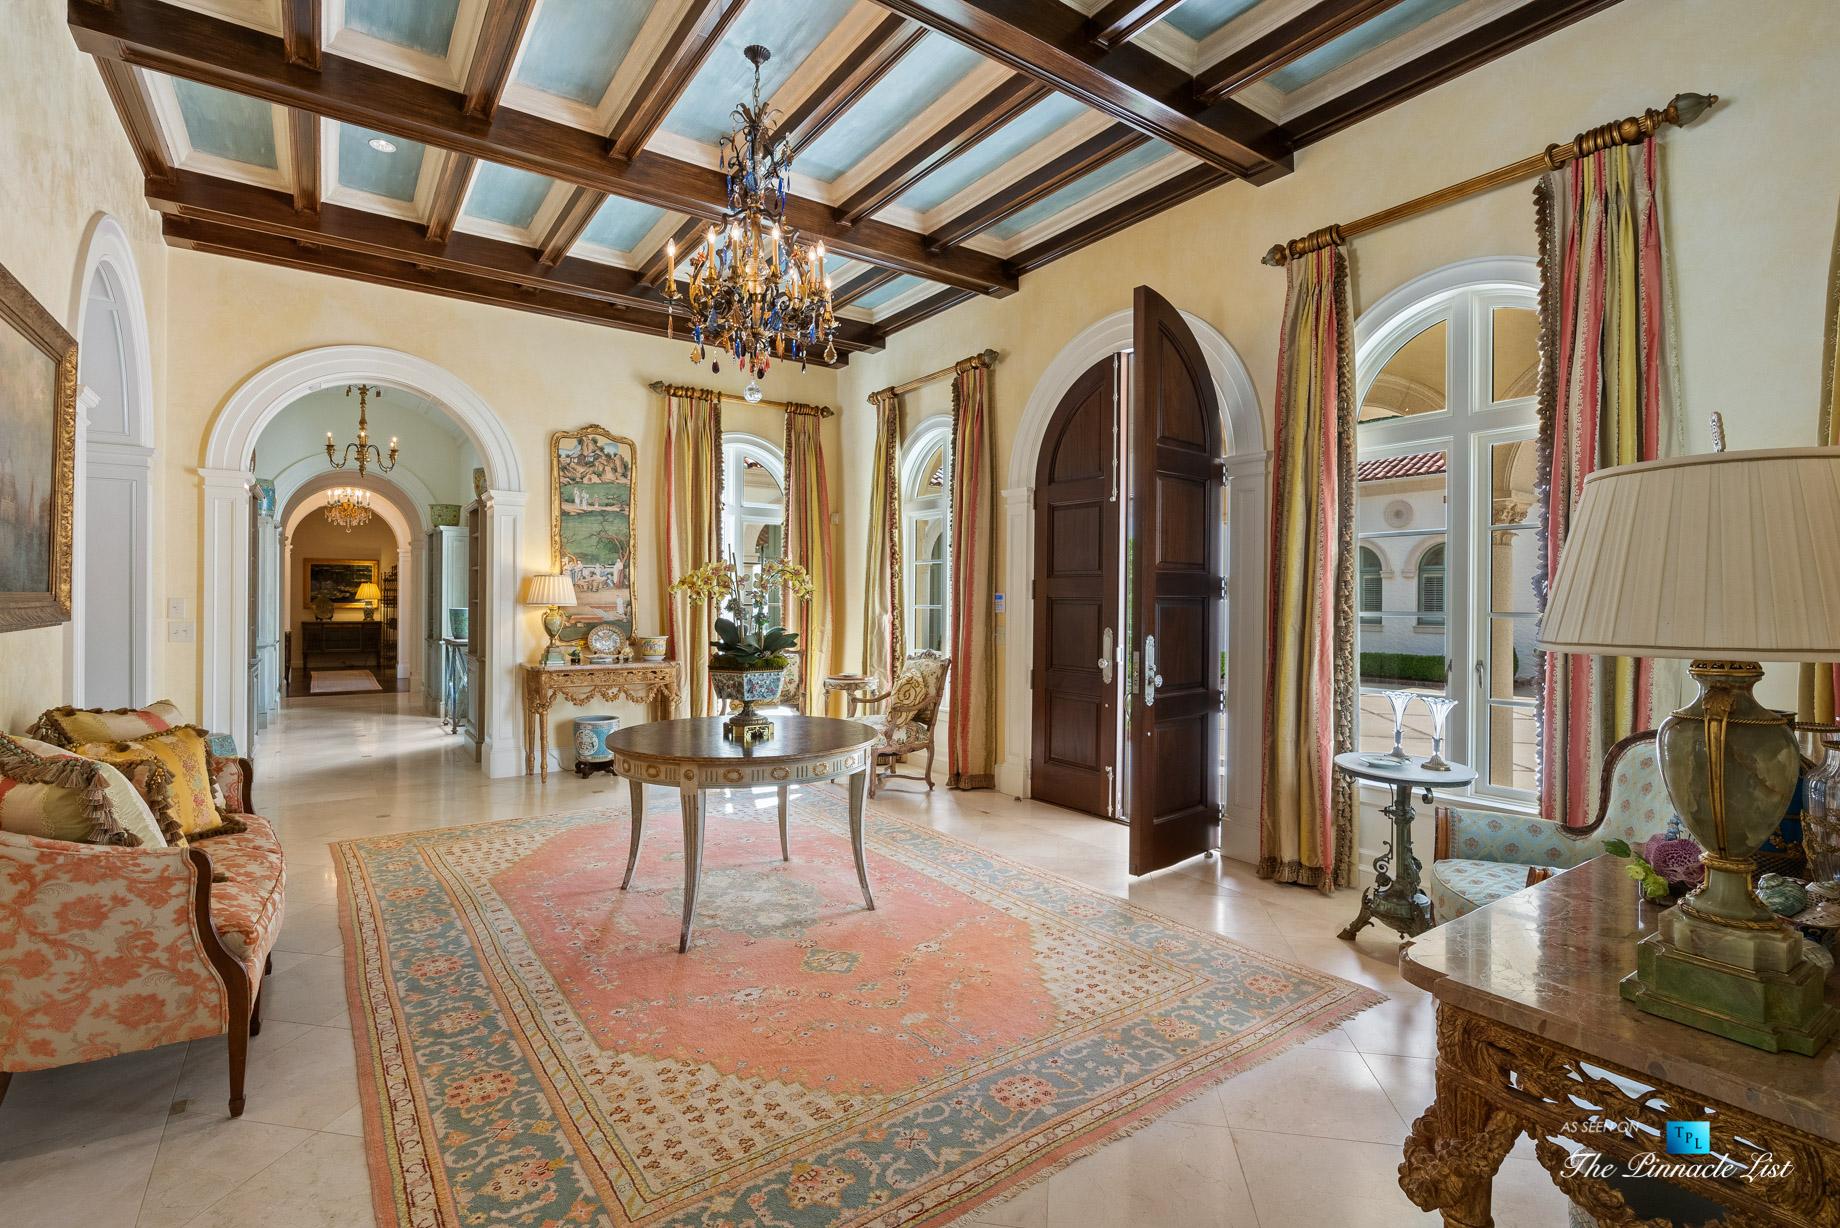 439 Blackland Rd NW, Atlanta, GA, USA – Sitting Area – Luxury Real Estate – Tuxedo Park Mediterranean Mansion Home